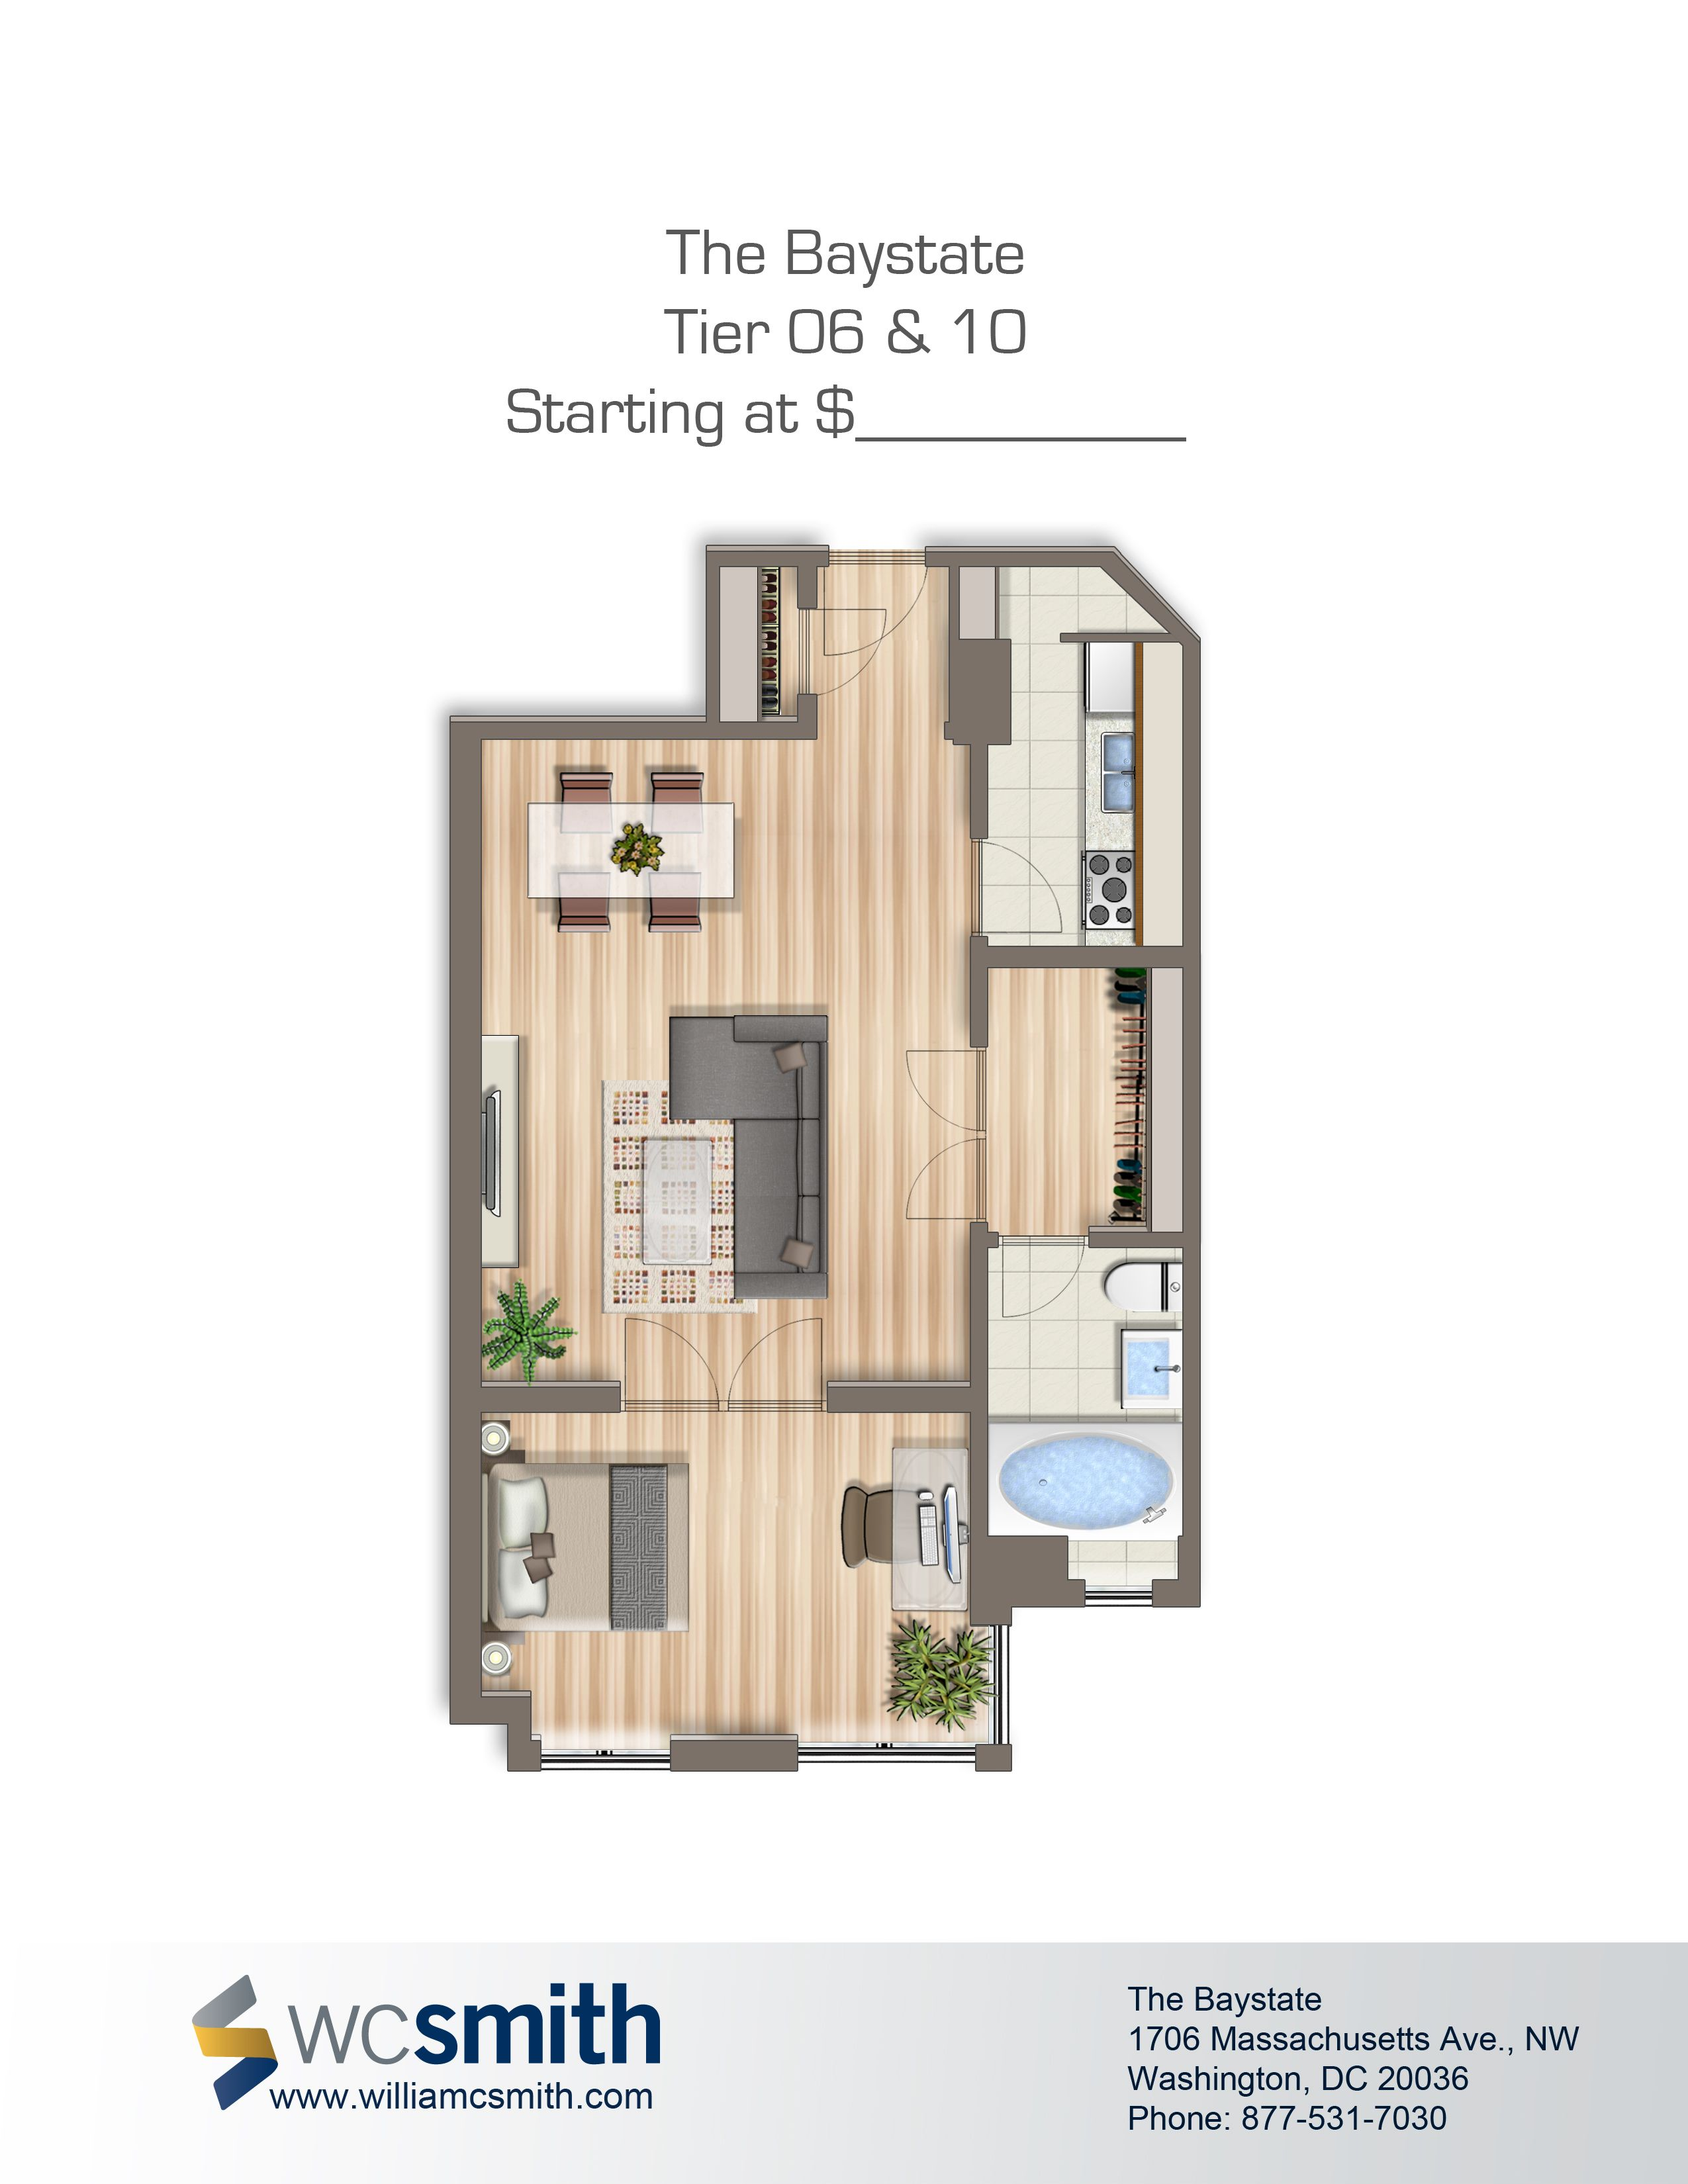 Baystate Apartments Floor plans, Apartment floor plans